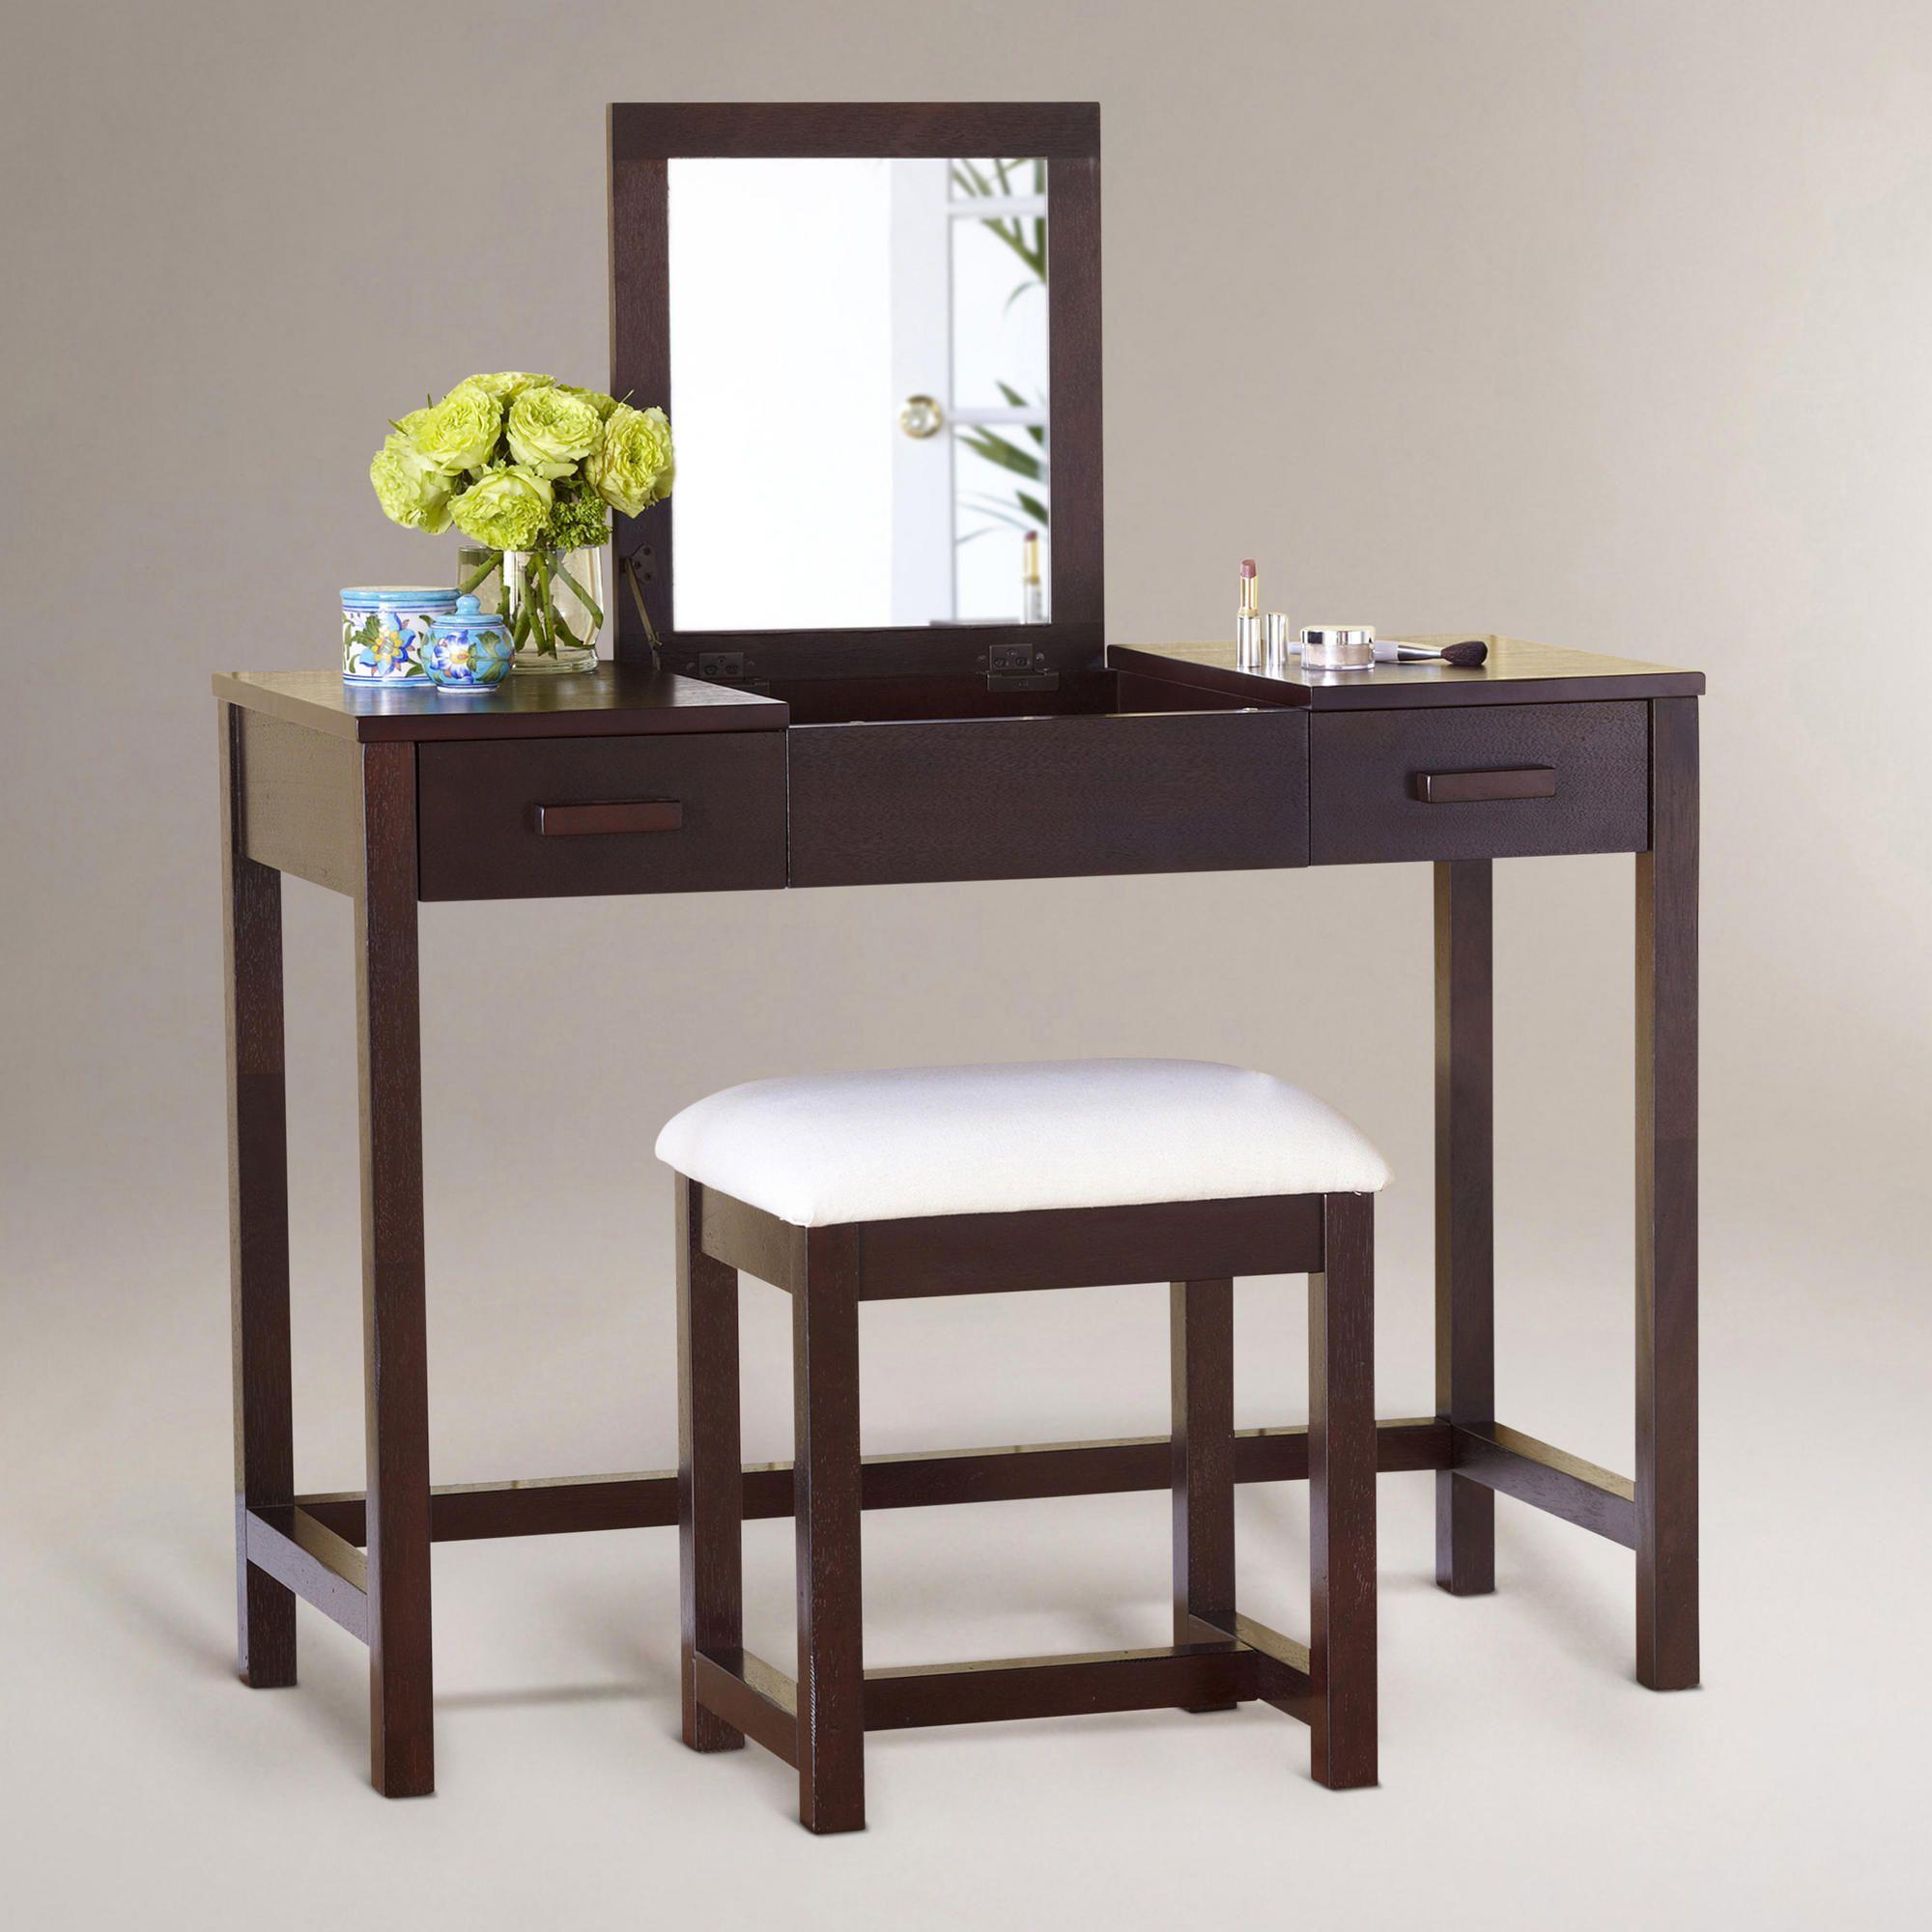 Dark mahogany chase vanity table sku 427632 249 99 sale 159 99